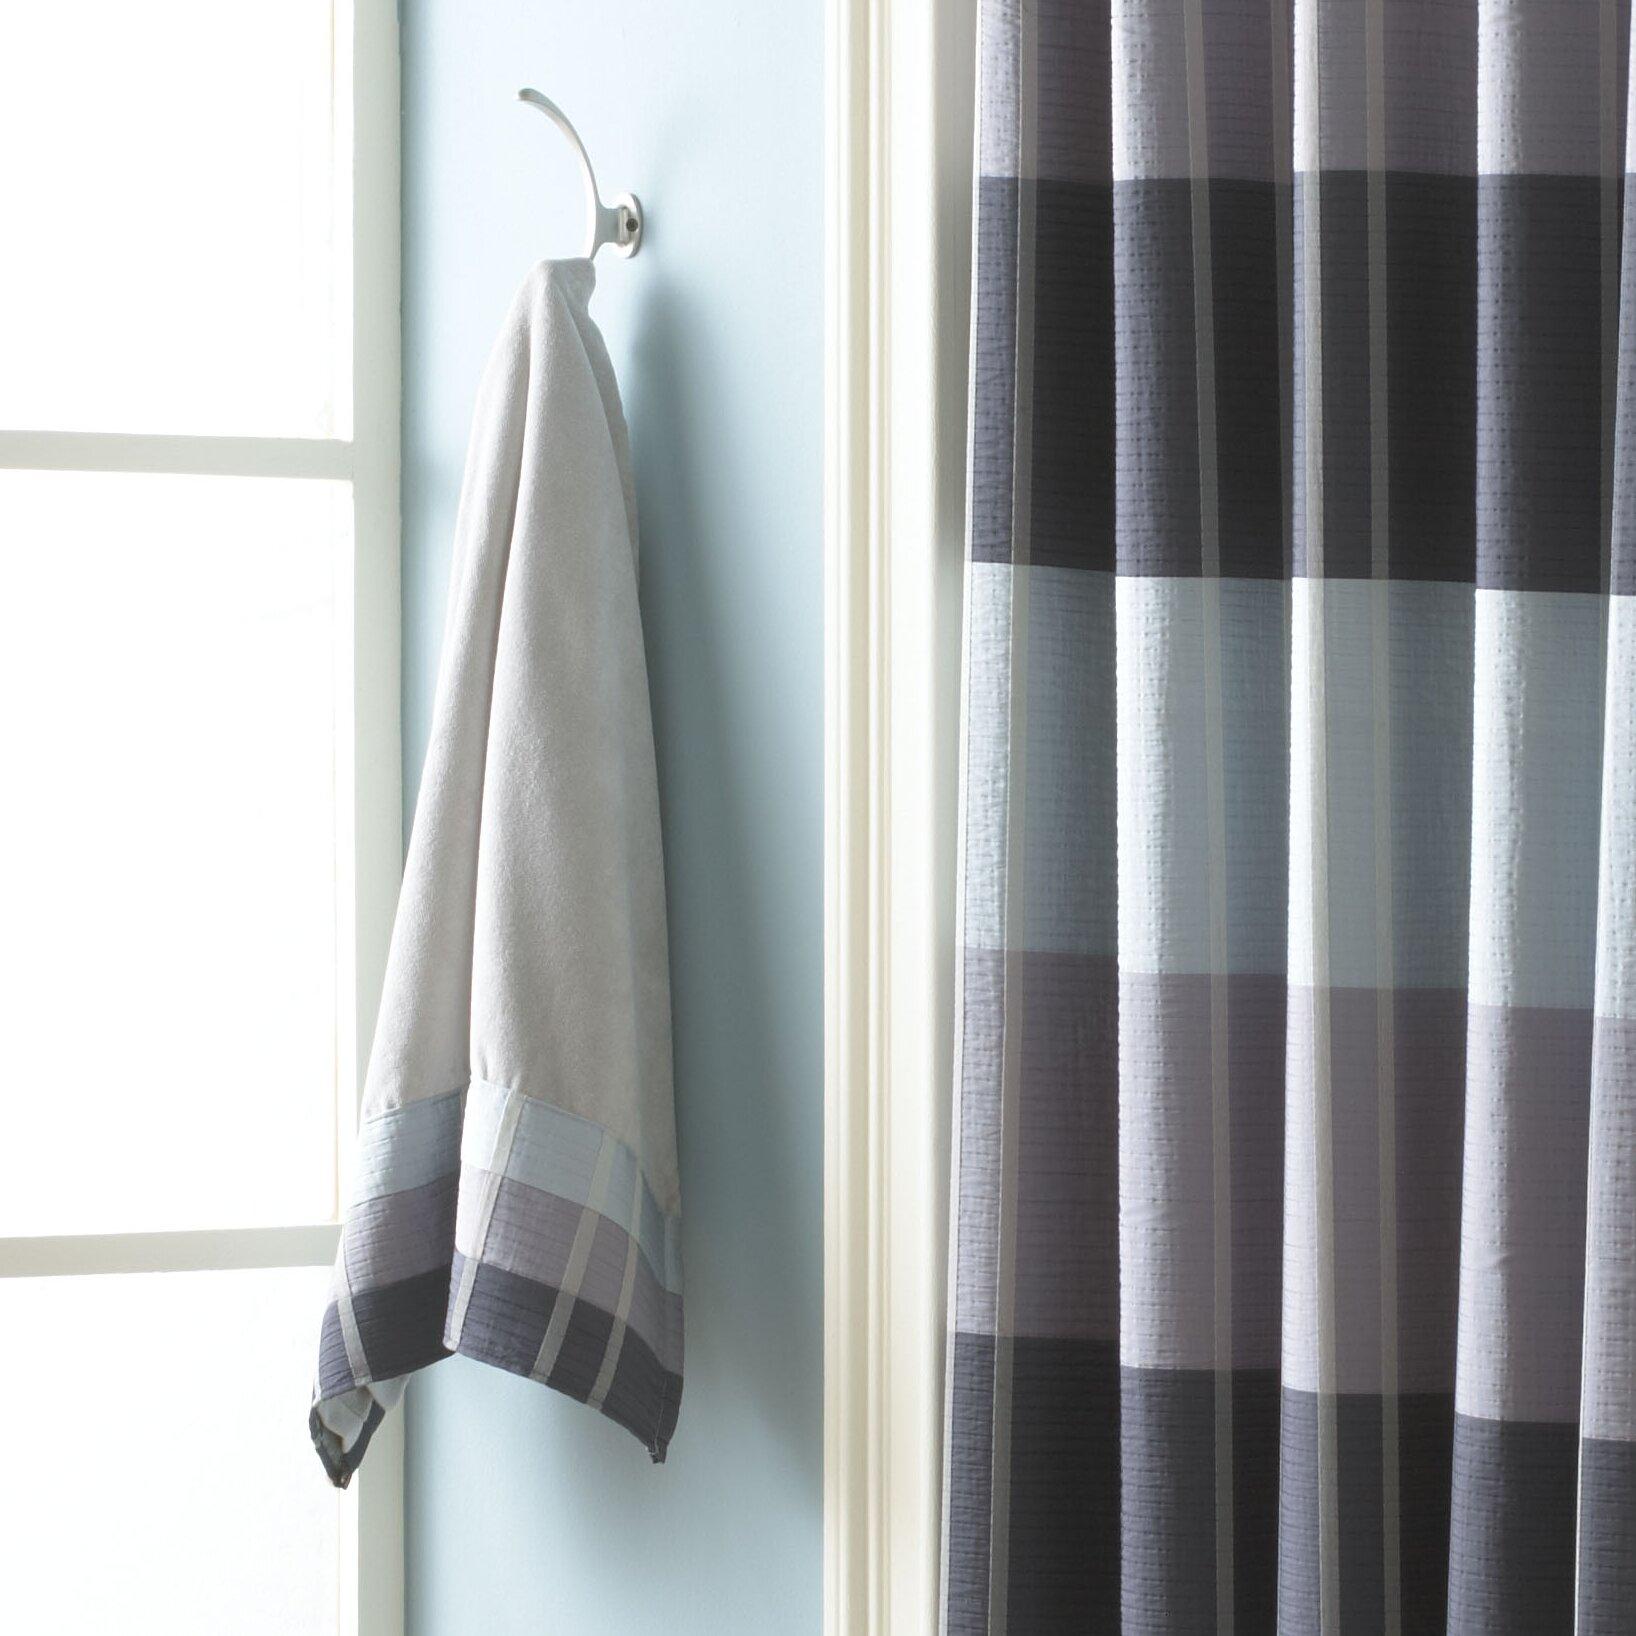 Croscill Kitchen Towels: Croscill Fairfax Embel Bath Towel & Reviews